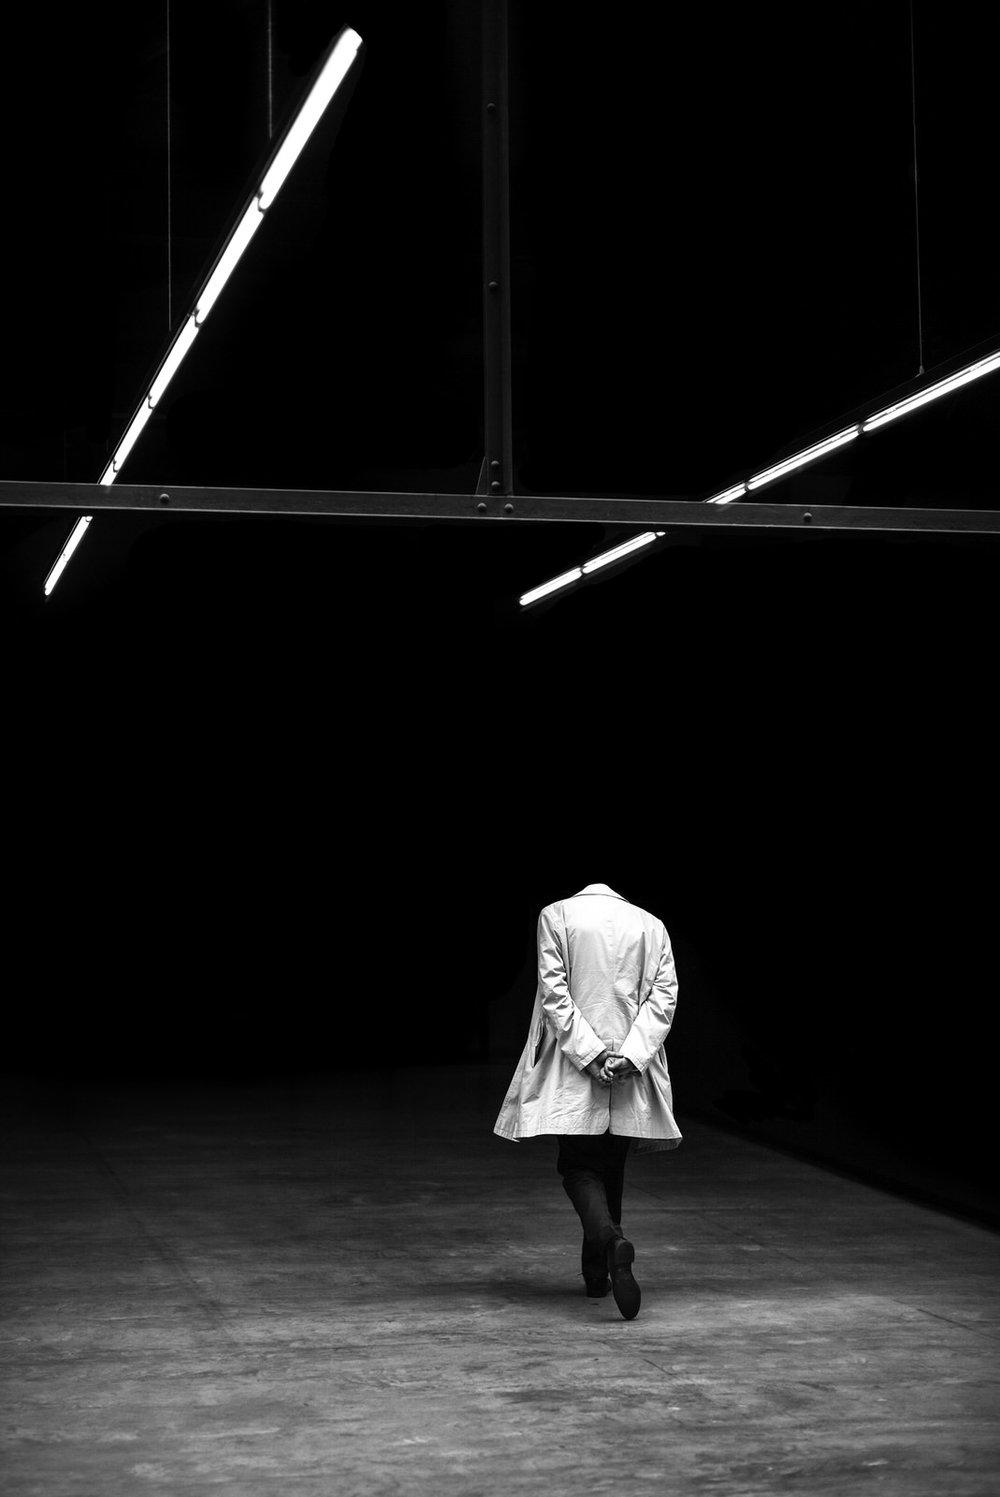 Alan Schaller - London Street Photographer - Metropolis27.jpg